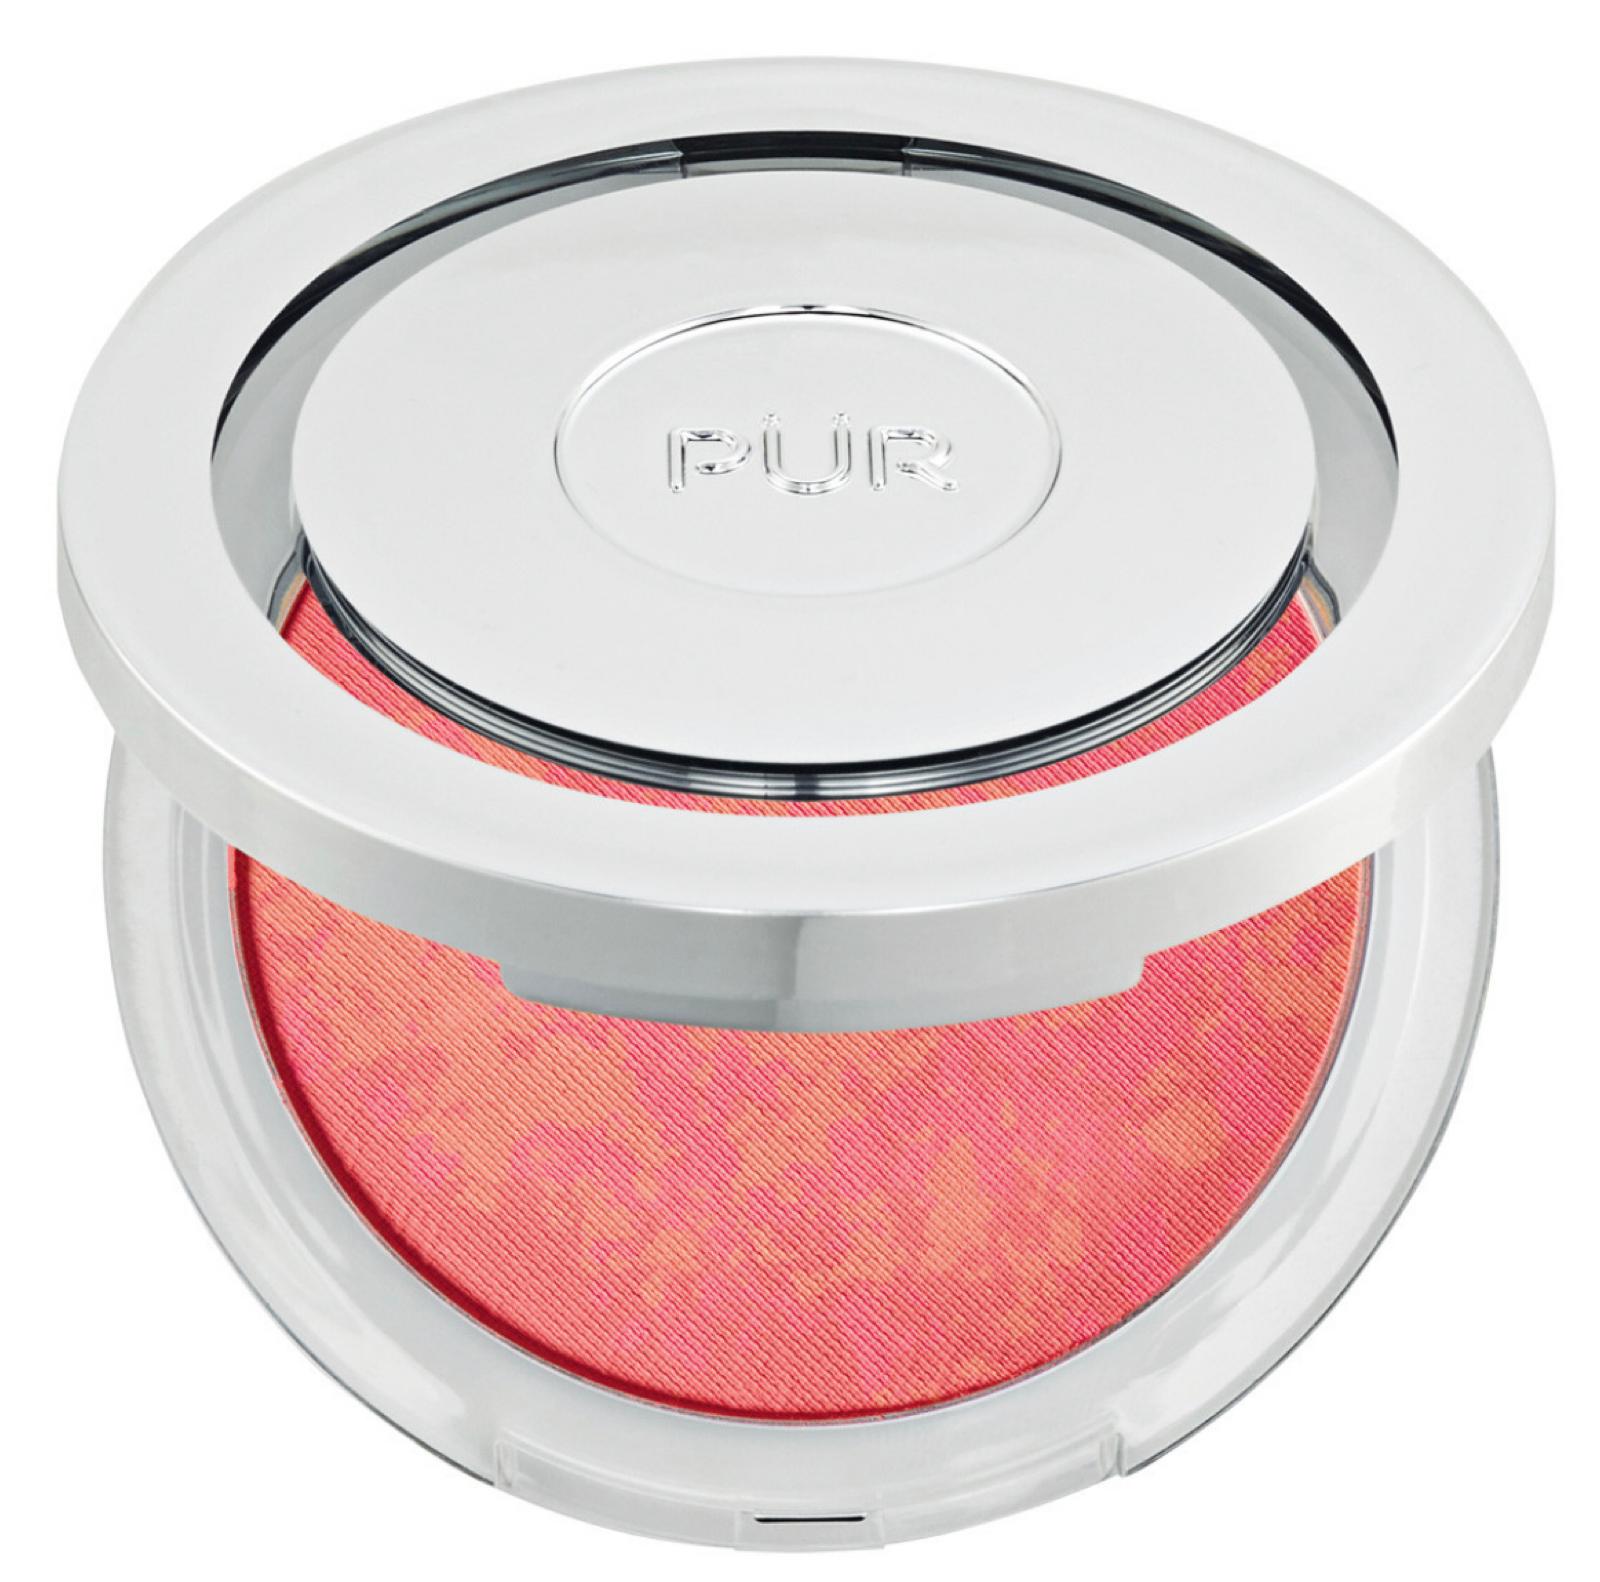 PUR Cosmetics Blushing Act Skin Perfecting Powders